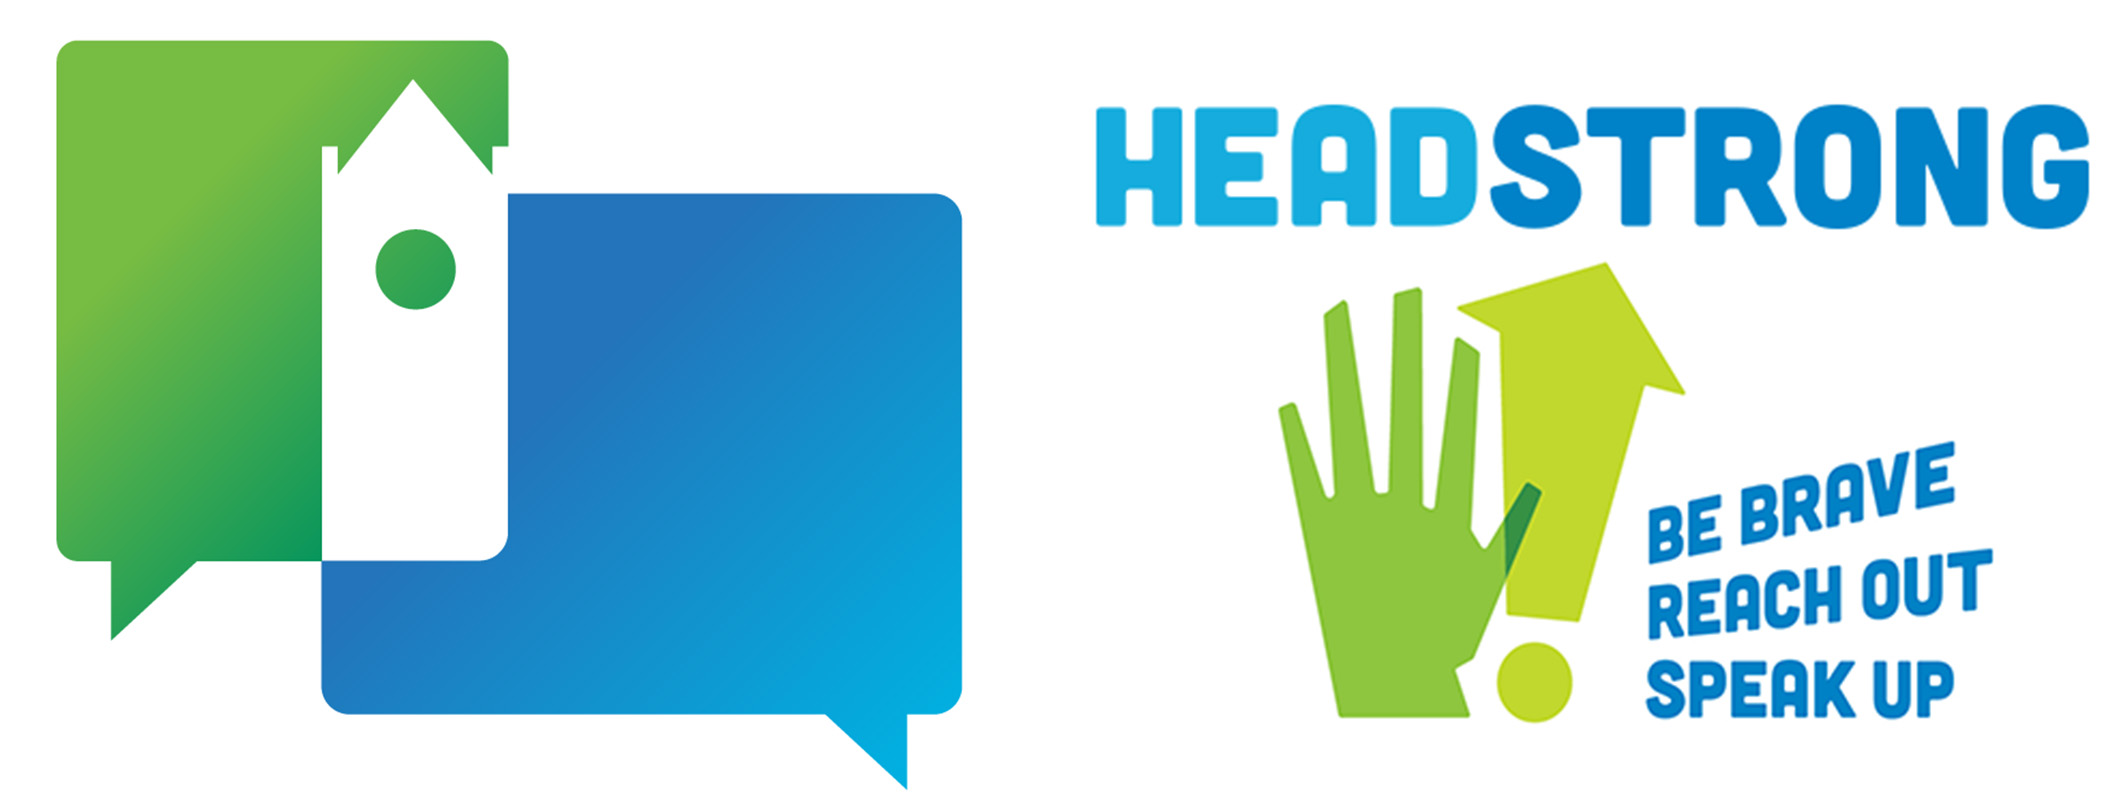 338_headstrong_logos_eng